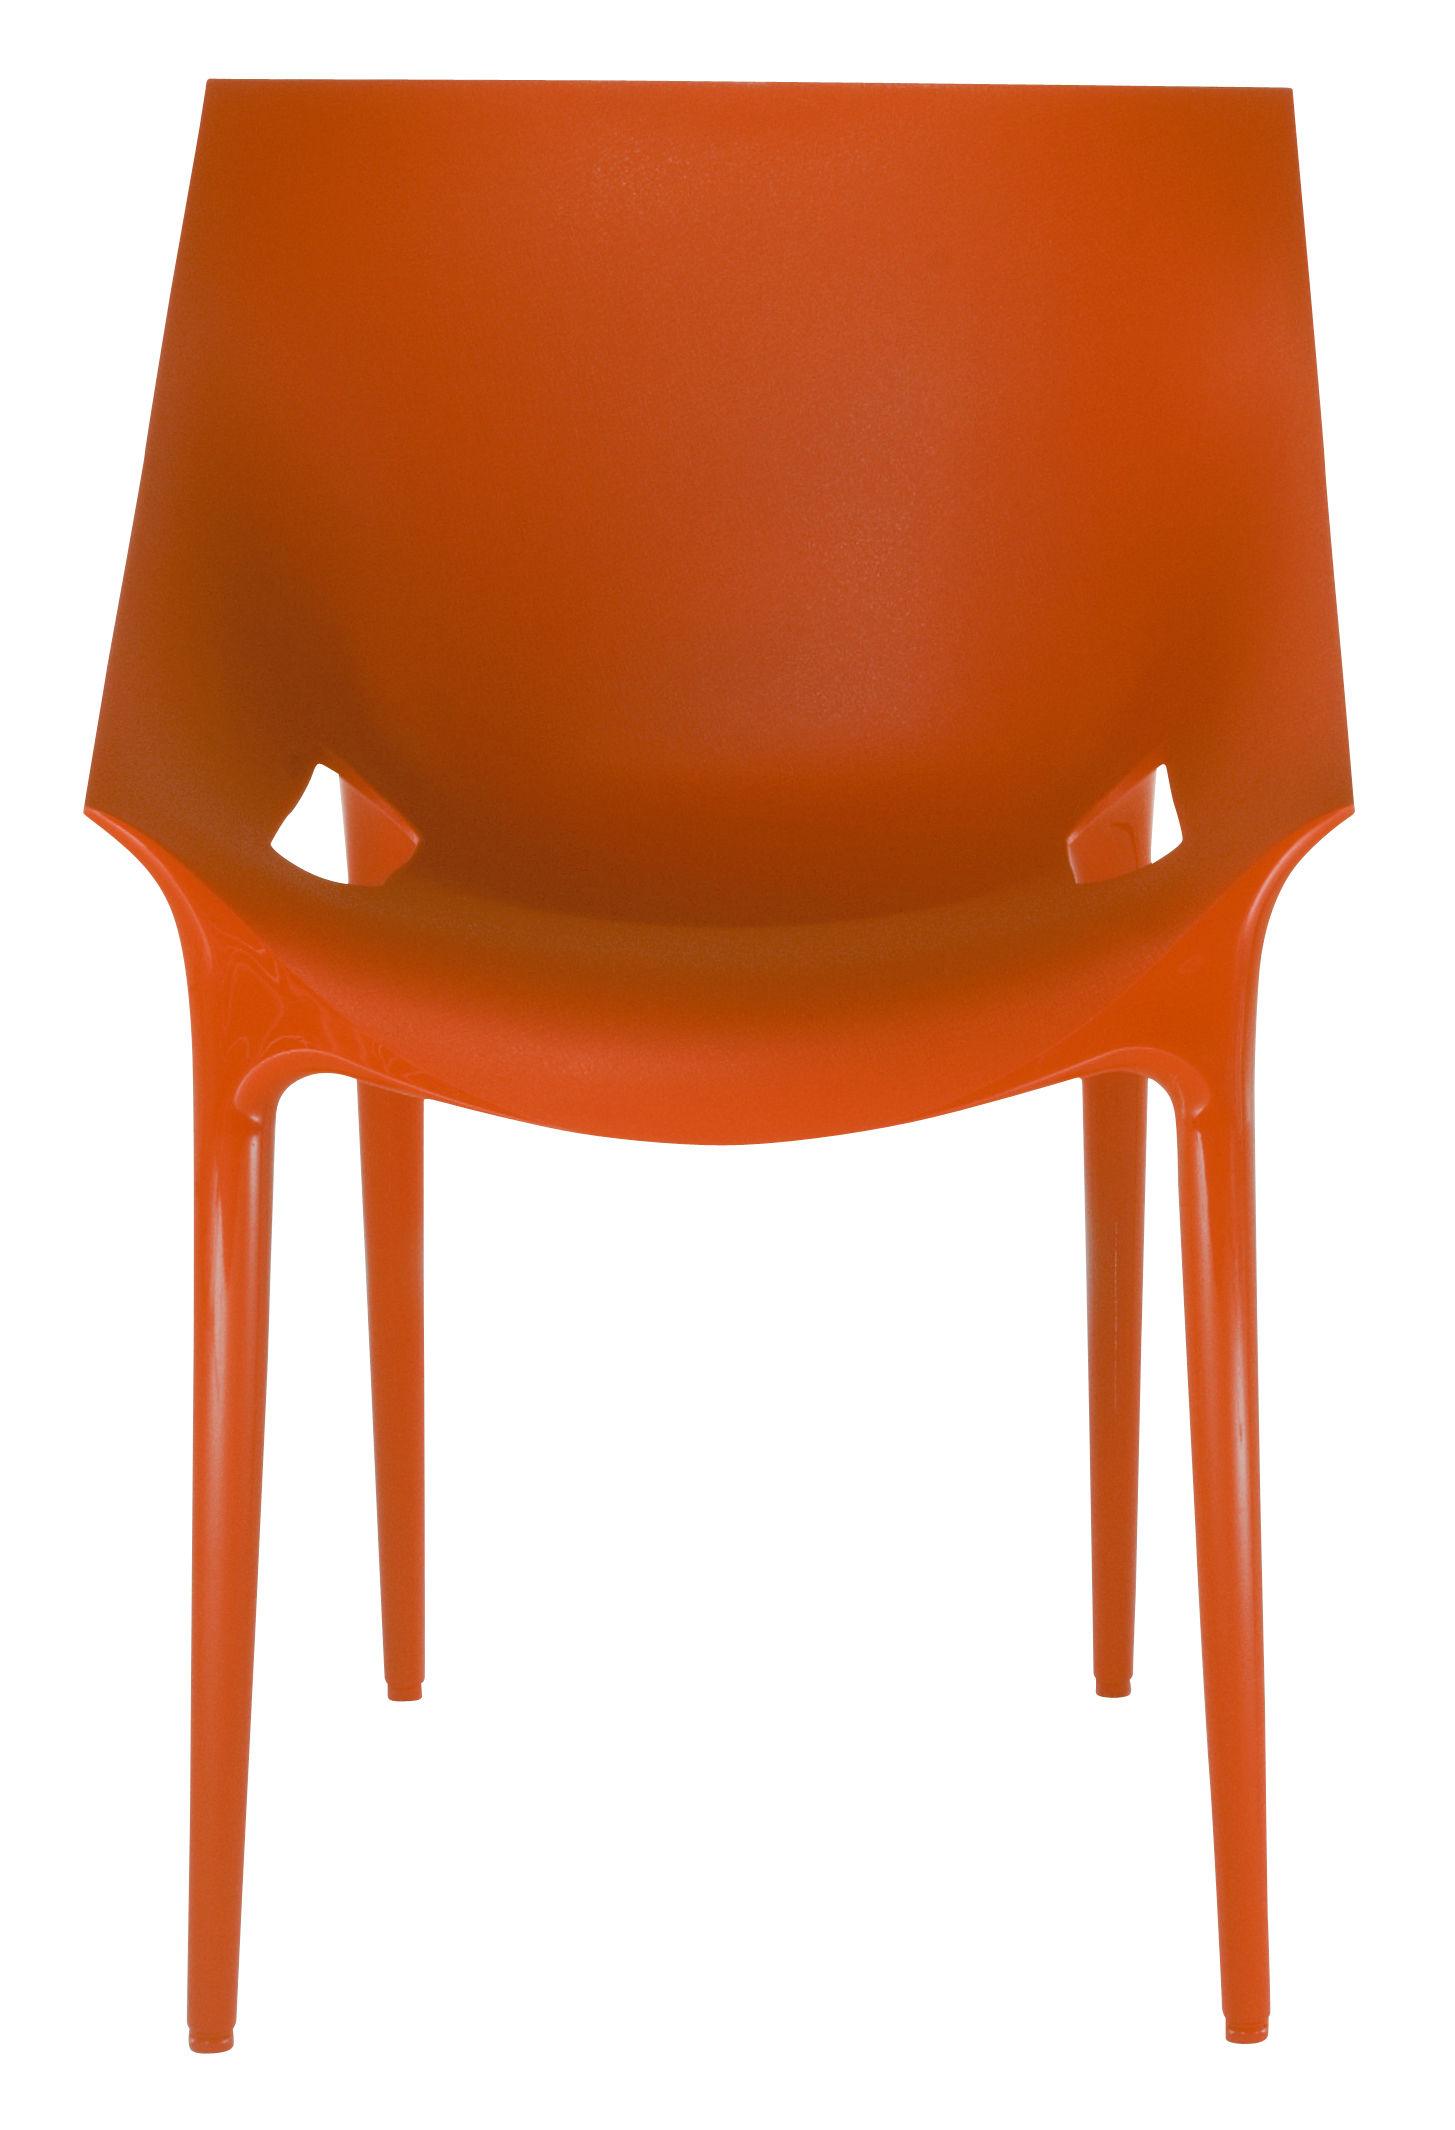 Arredamento - Sedie  - Poltrona impilabile Dr. YES di Kartell - Rosso aranciato - Polipropilene